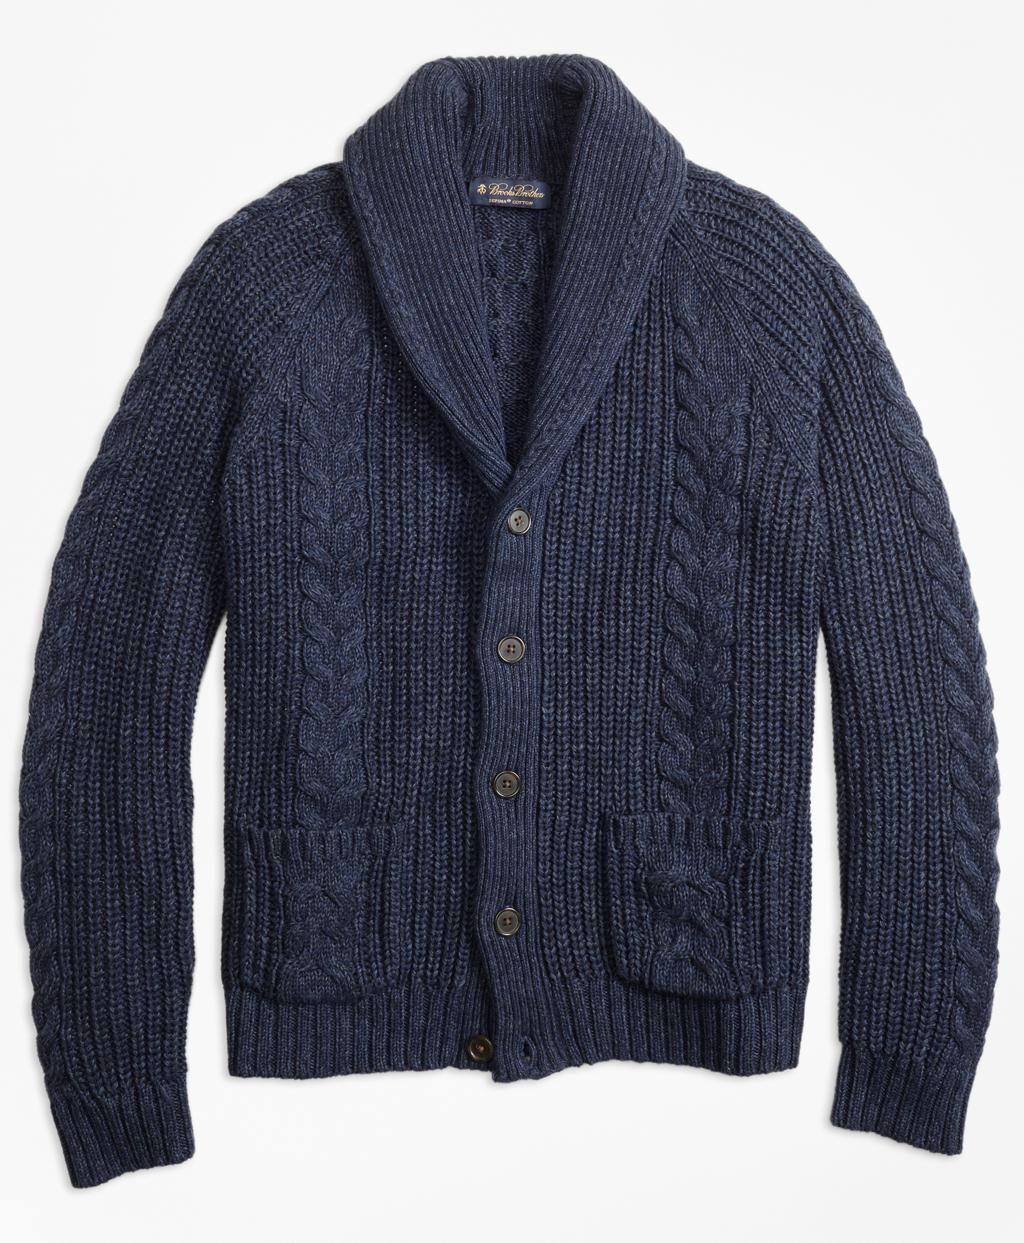 9f085ed021 Brooks Brothers Men s Blue Cable Knit Shawl Collar Cardigan ...